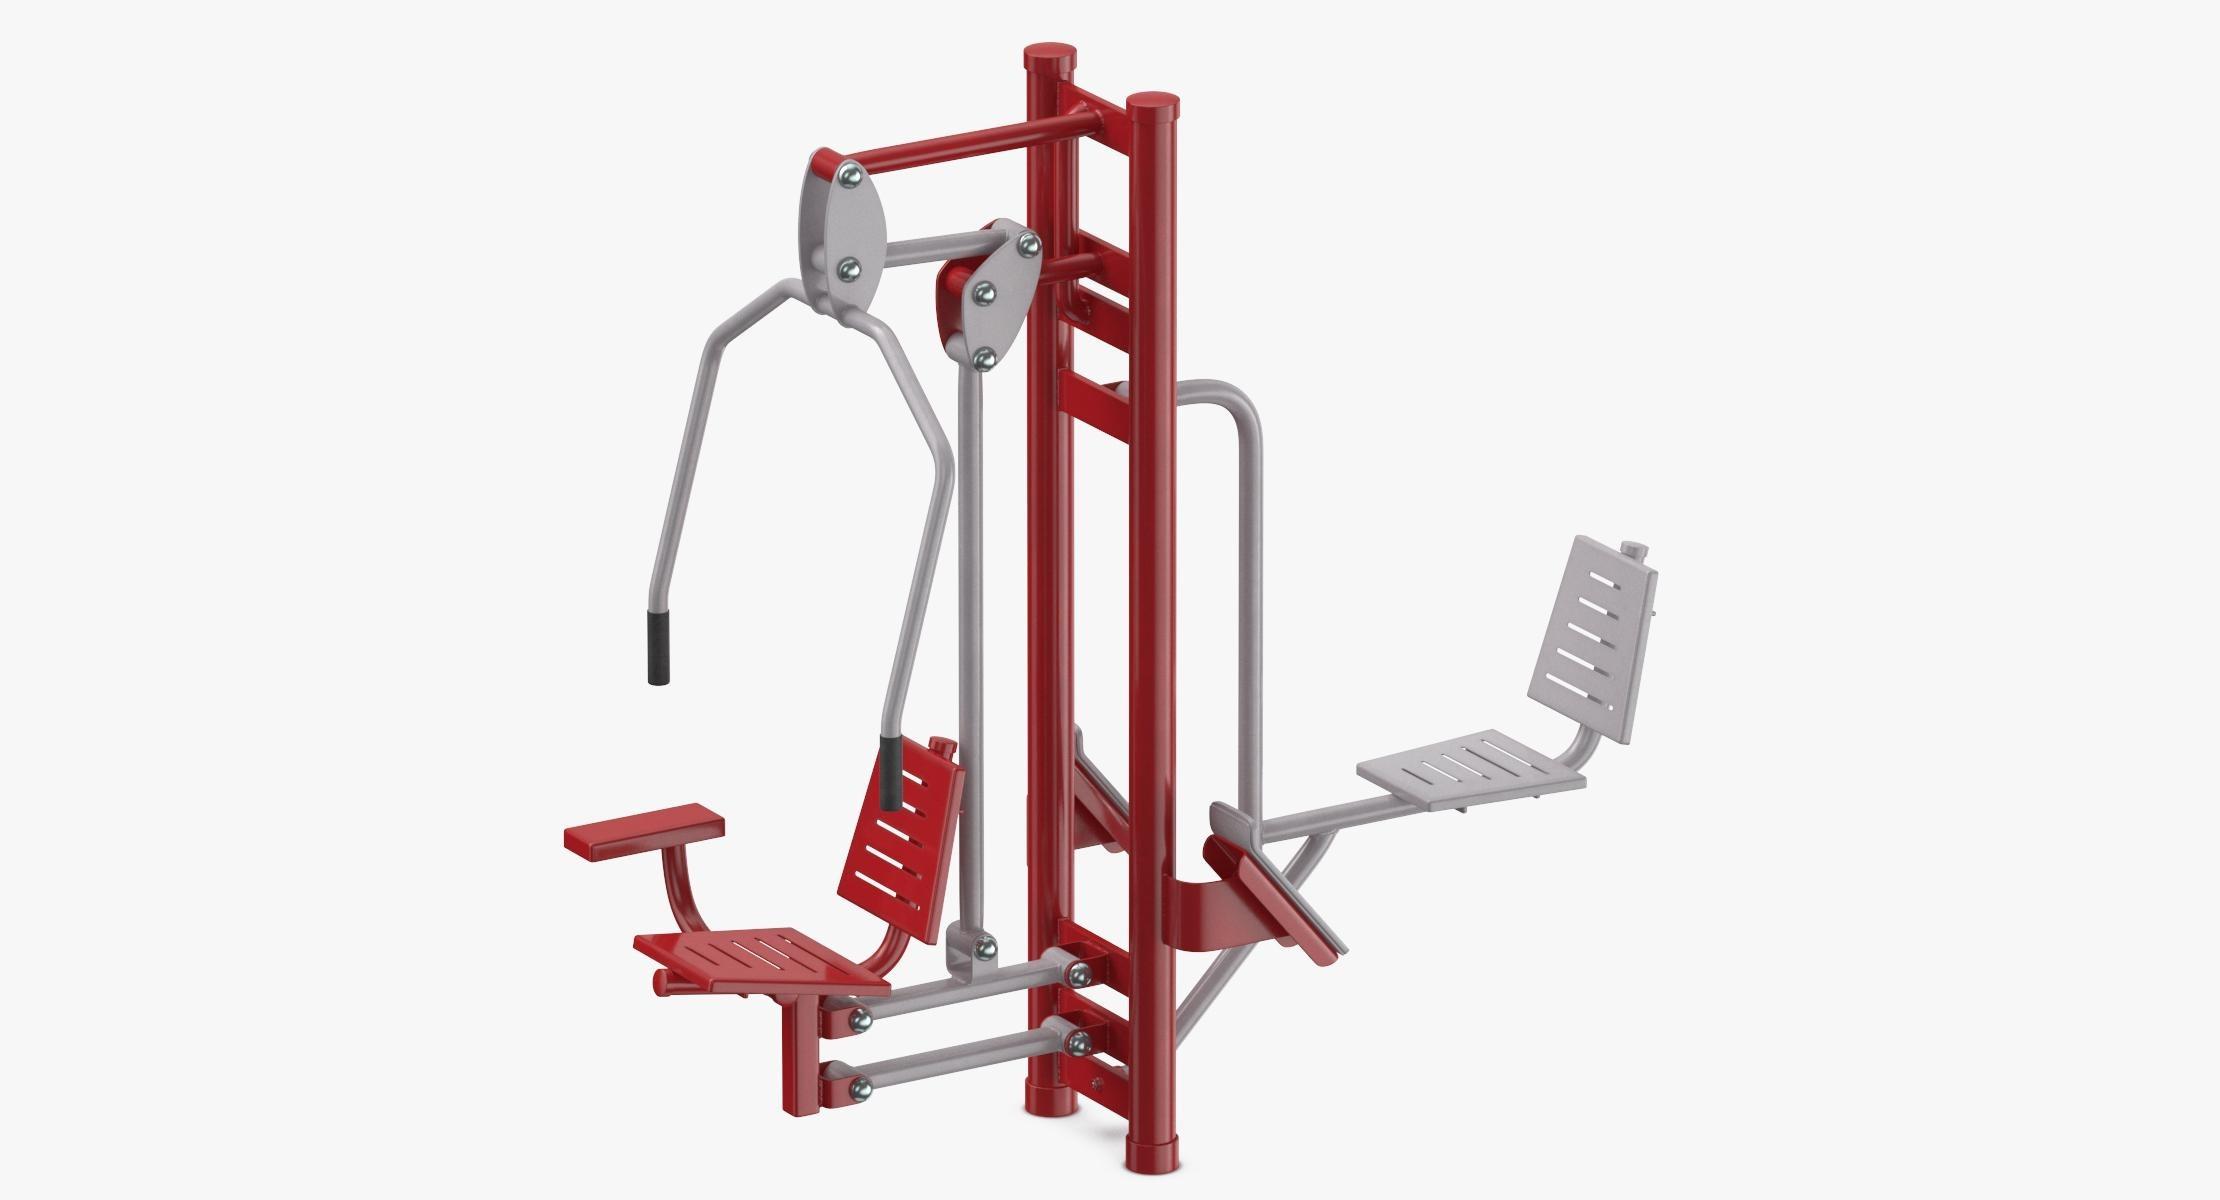 Street Fitness Equipment 01 03 - reel 1